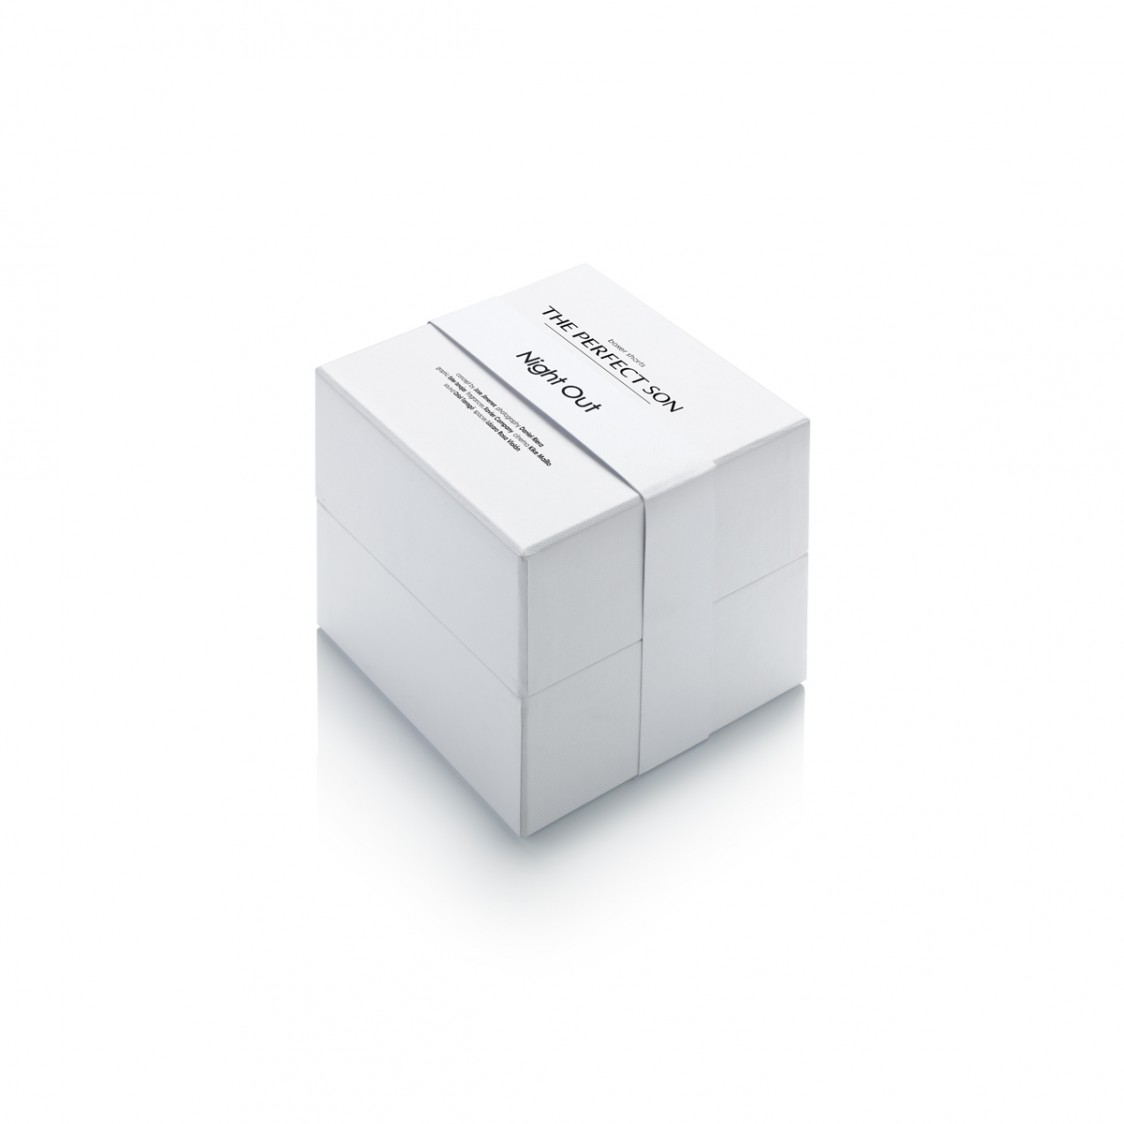 Night out caja cerrada tipo cubo con calzoncillo negro de lujo para hombre